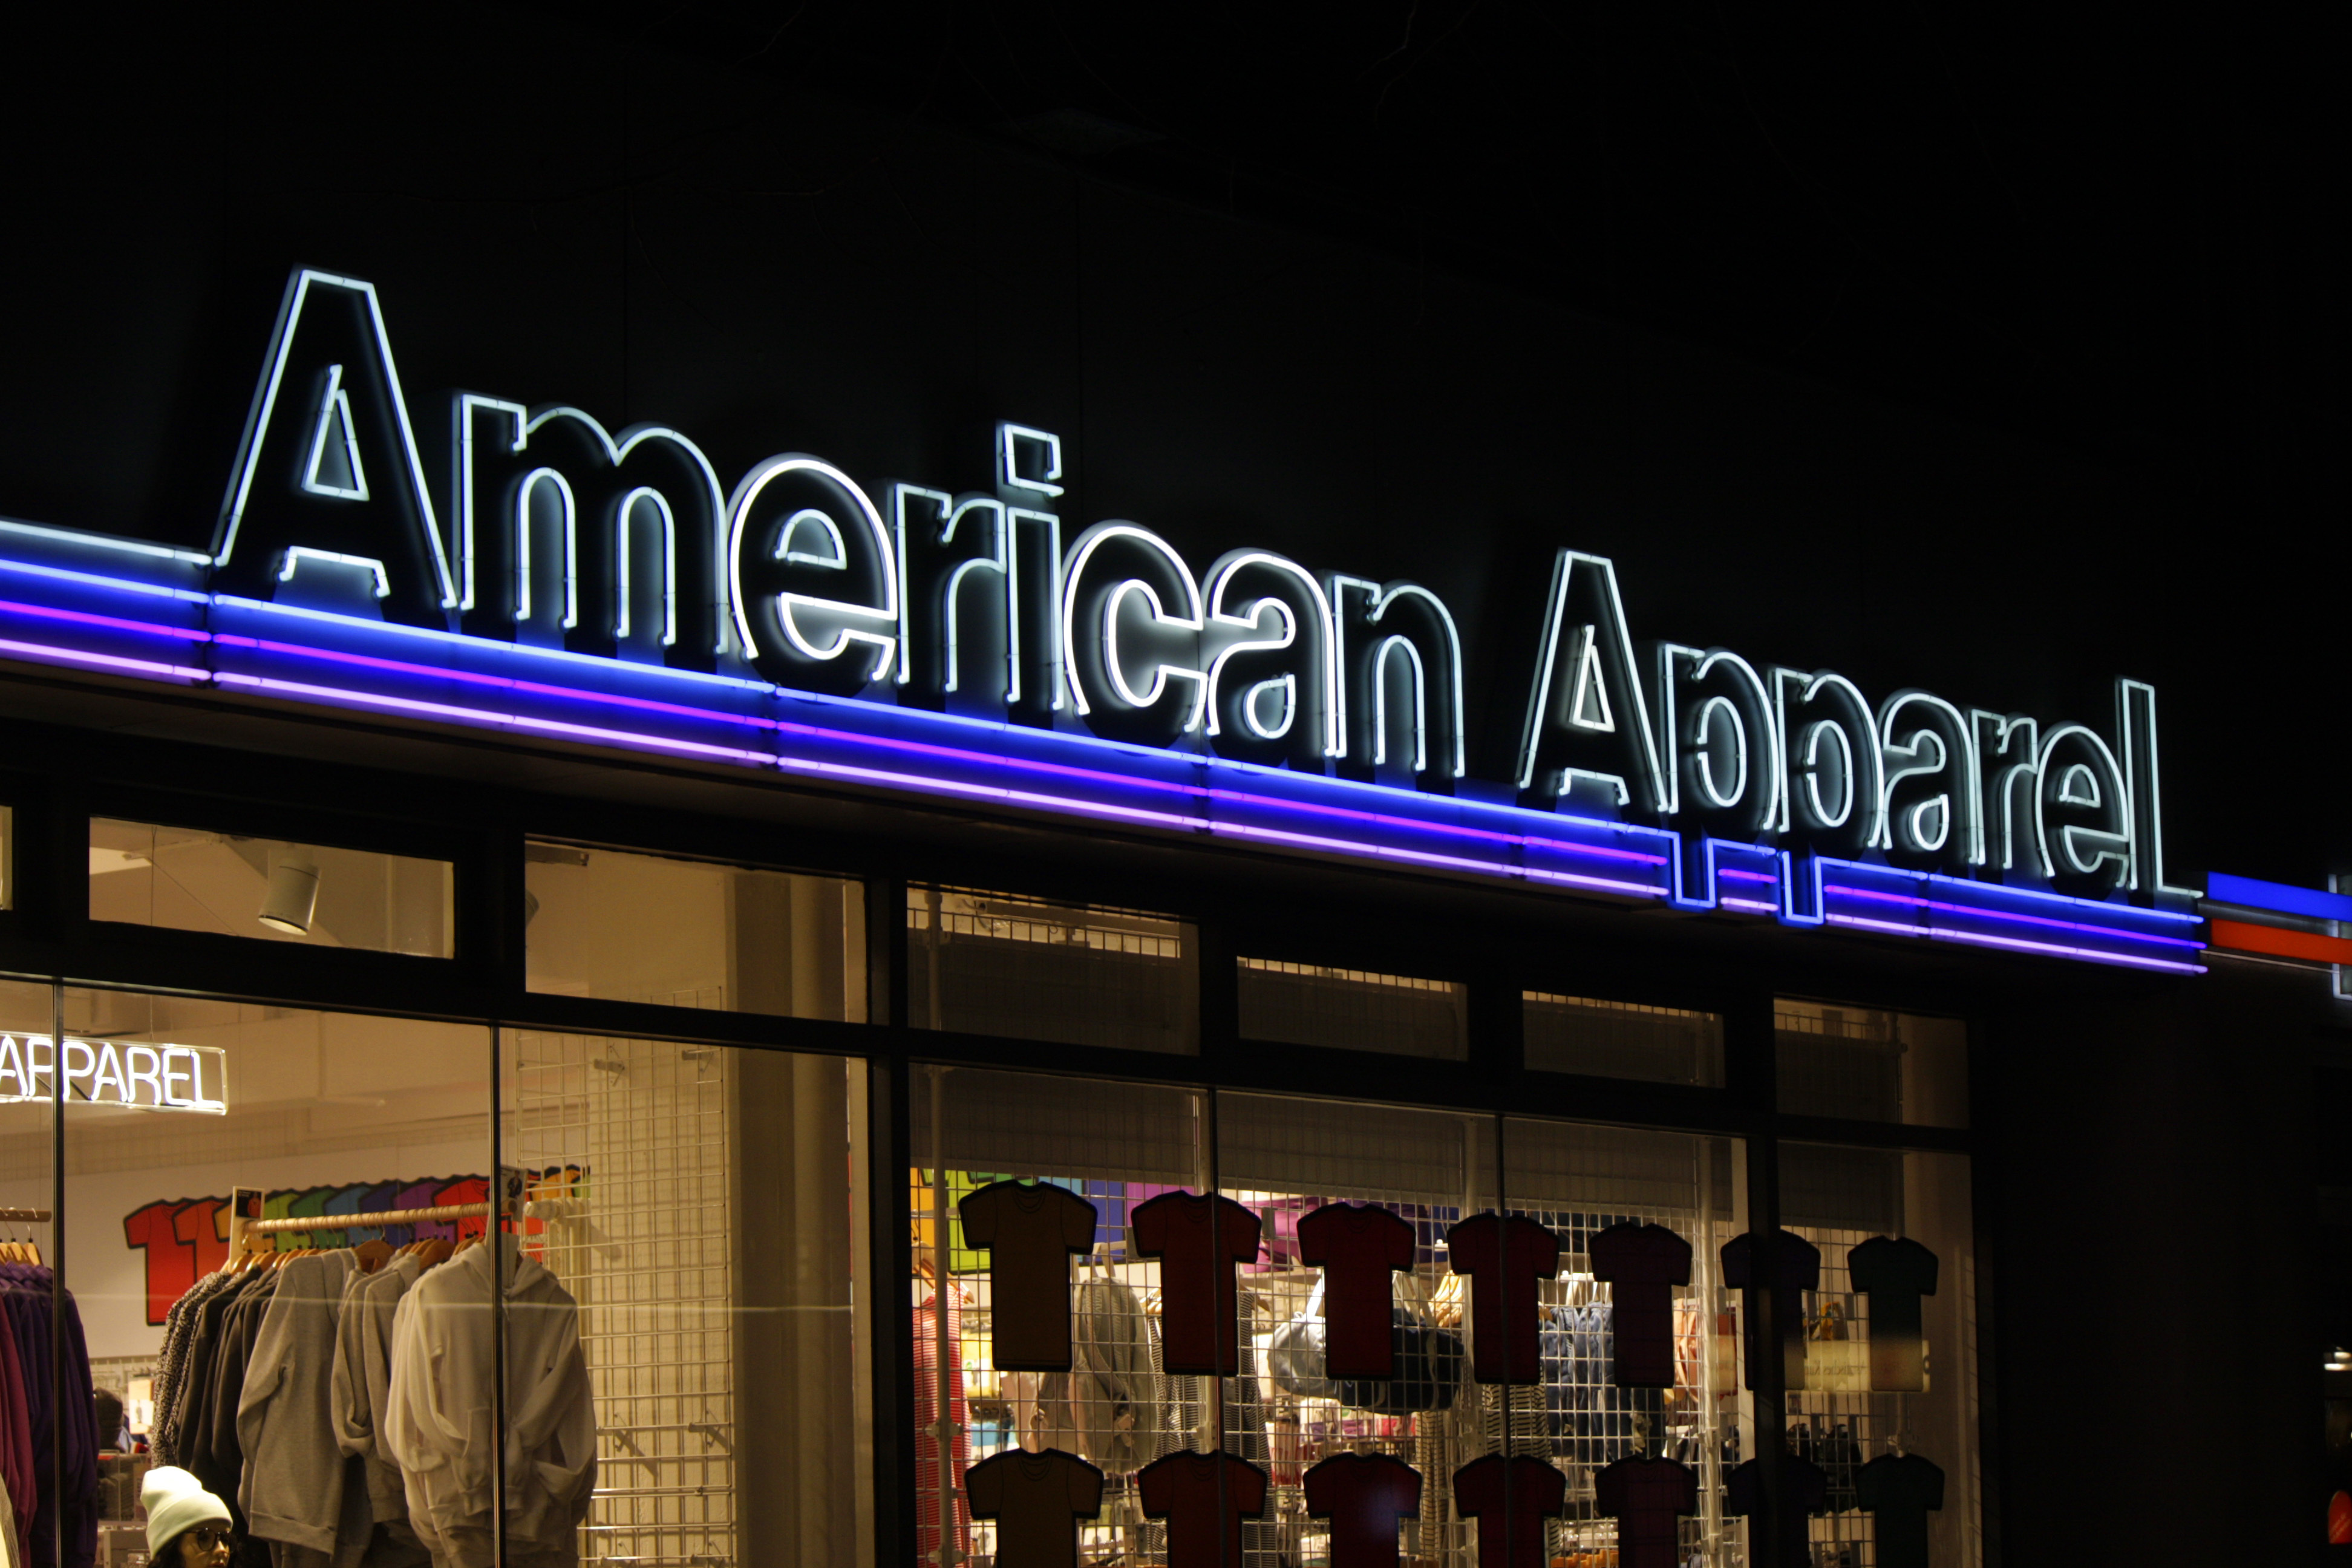 Gildan bought American Apparel's assets through a bankruptcy auction.